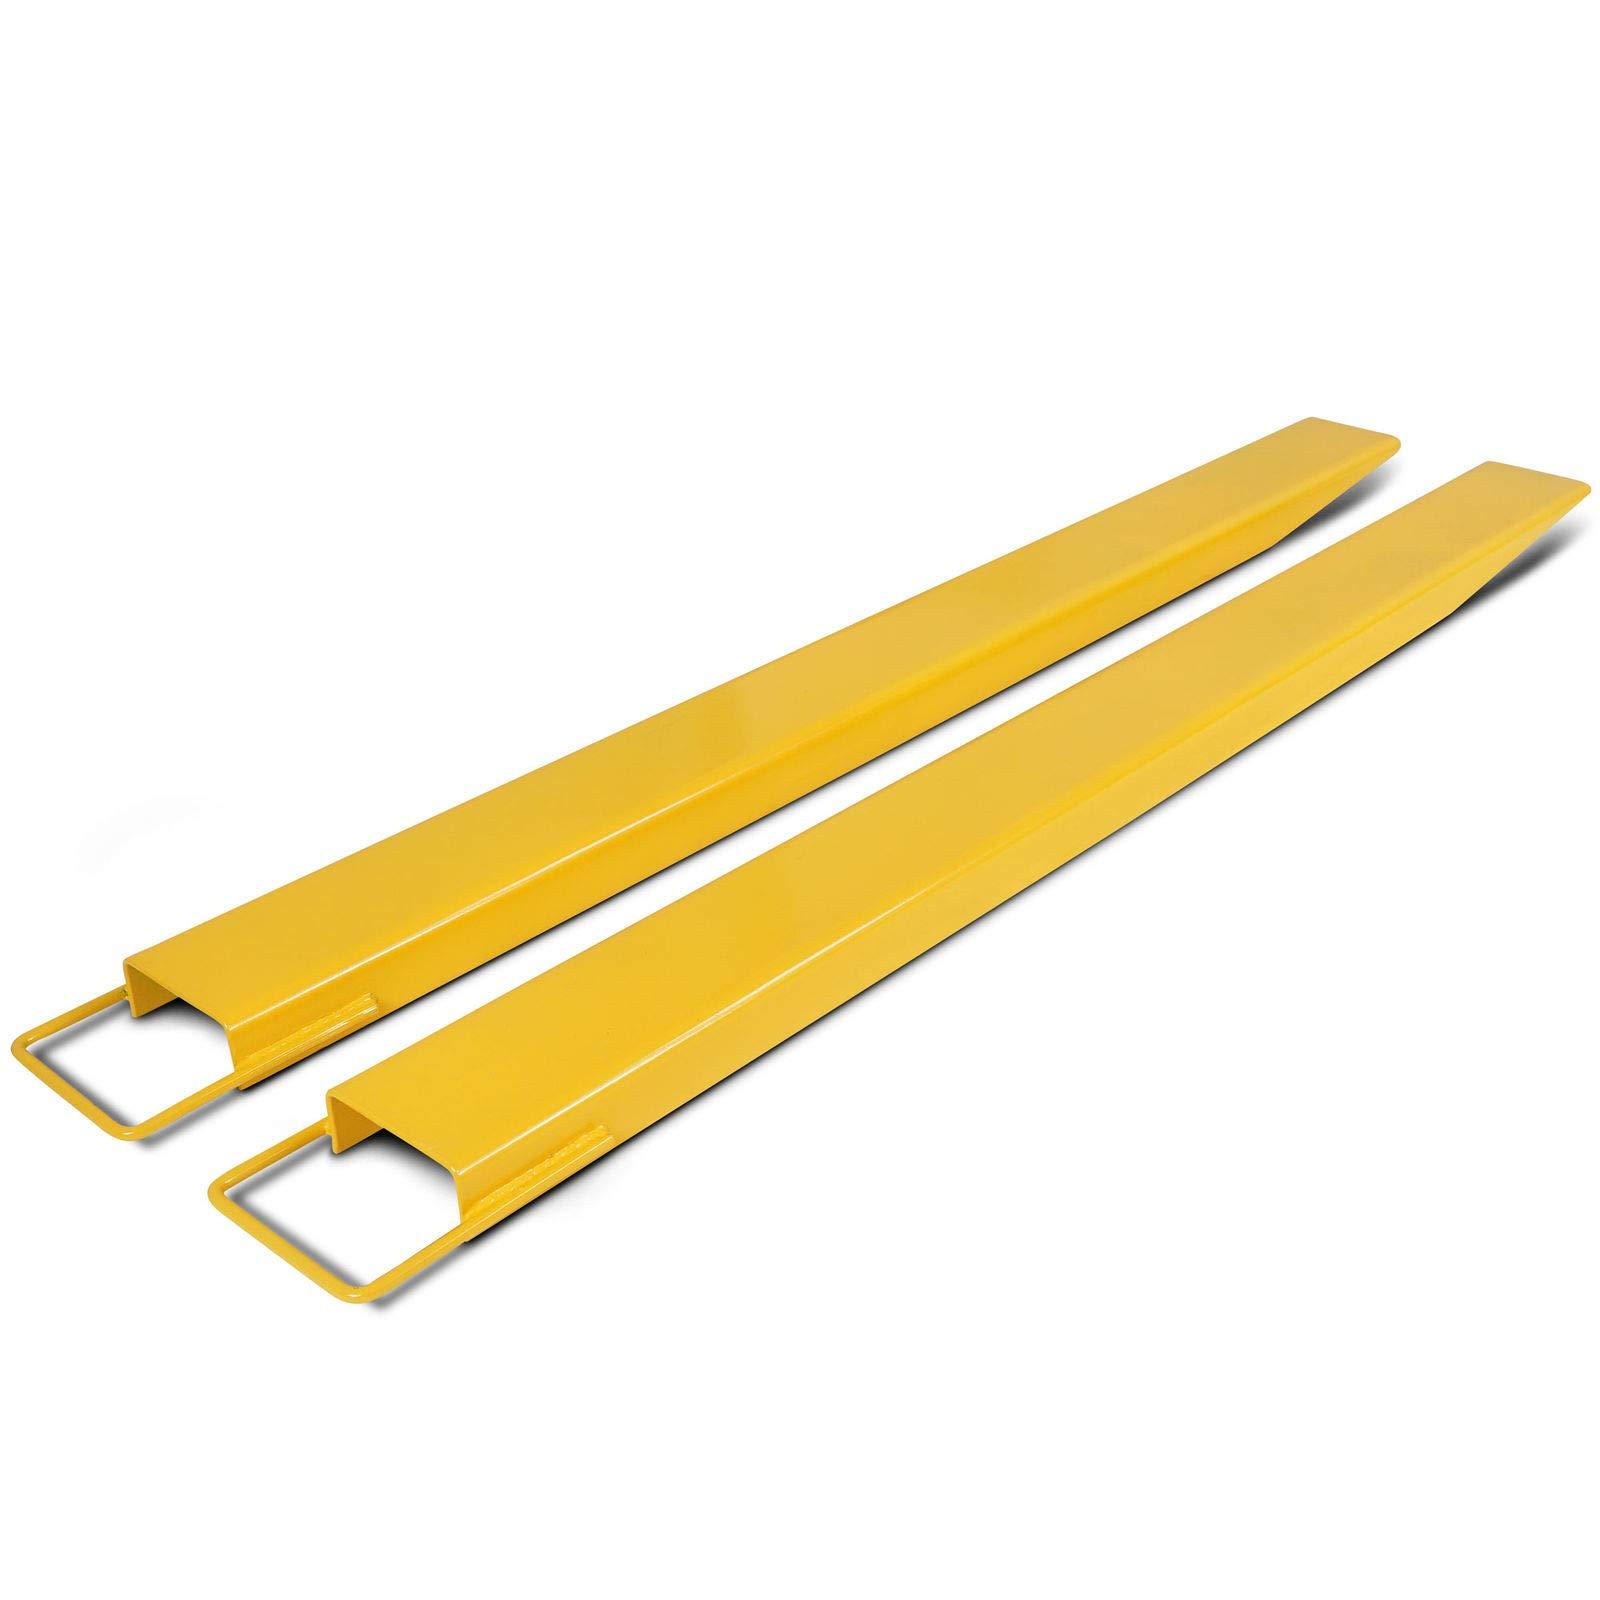 ECOTRIC 84'' Pallet Fork Extensions for forklifts Lift Truck Slide on Steel 5.5''